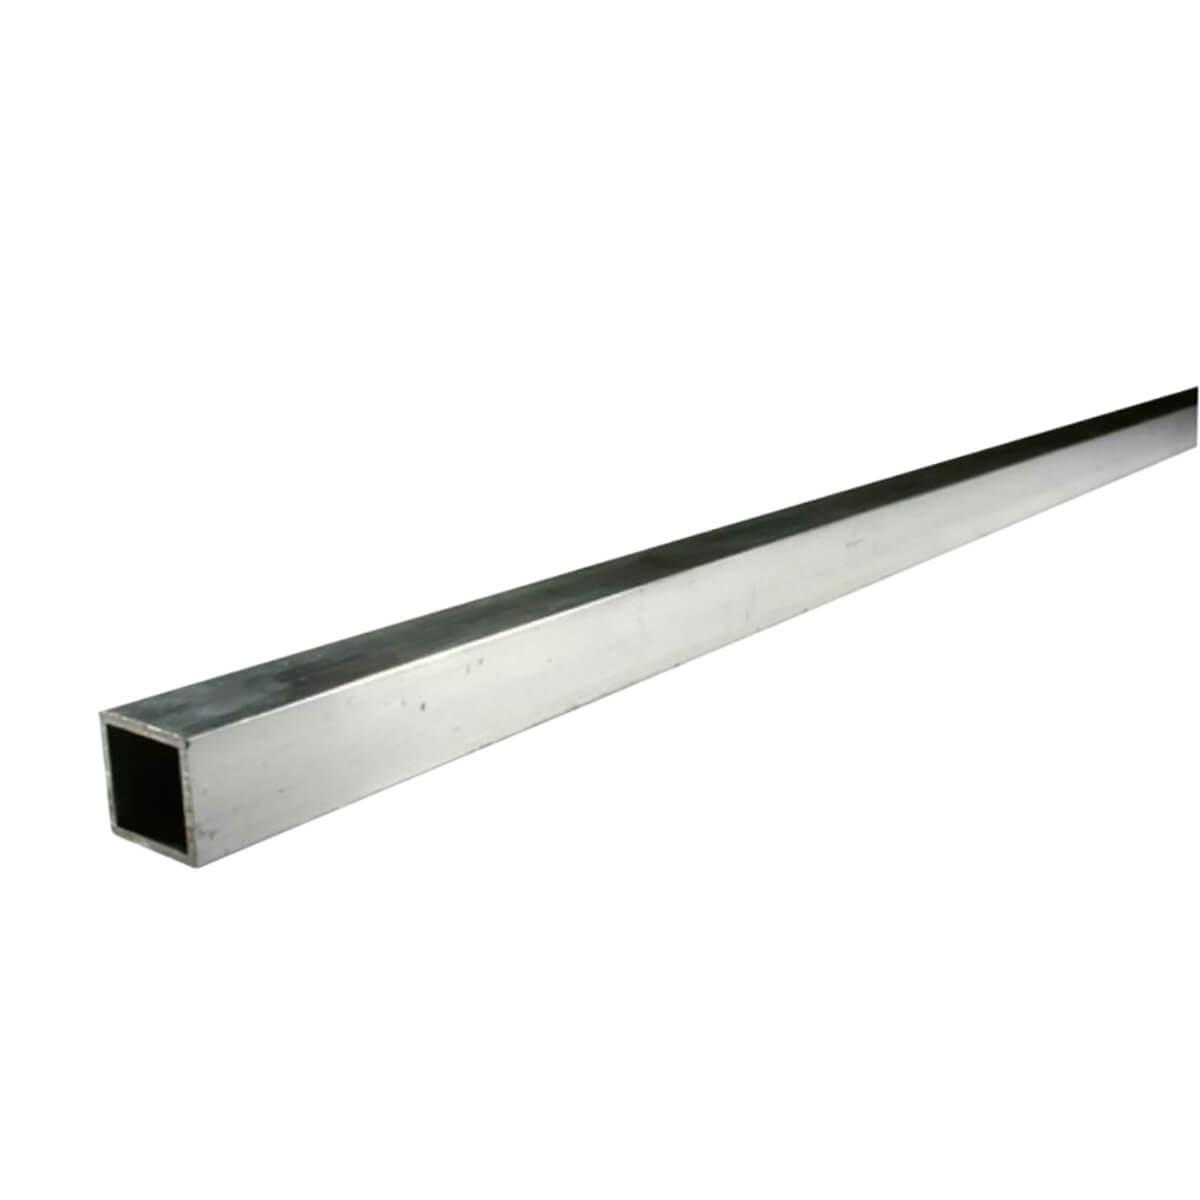 Square Tubing - Steel - 16 Gauge - 3/4-in X 4-ft